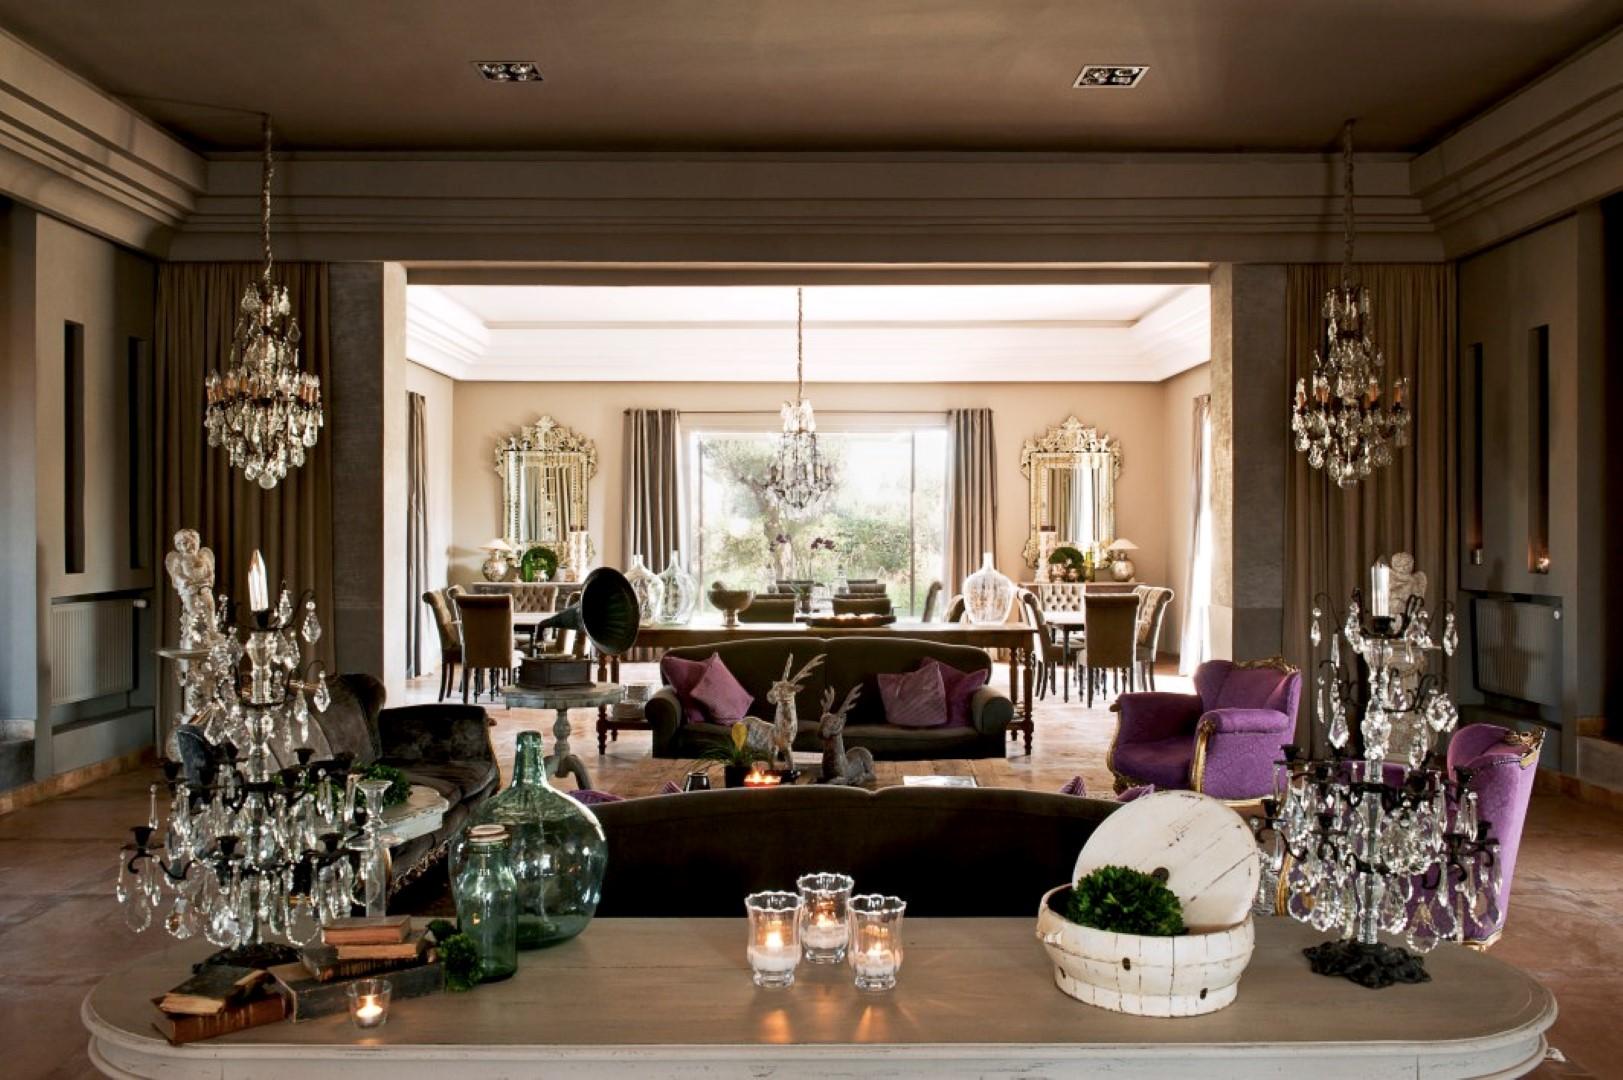 Location Villa Marrakech Villa Chic Boh Me